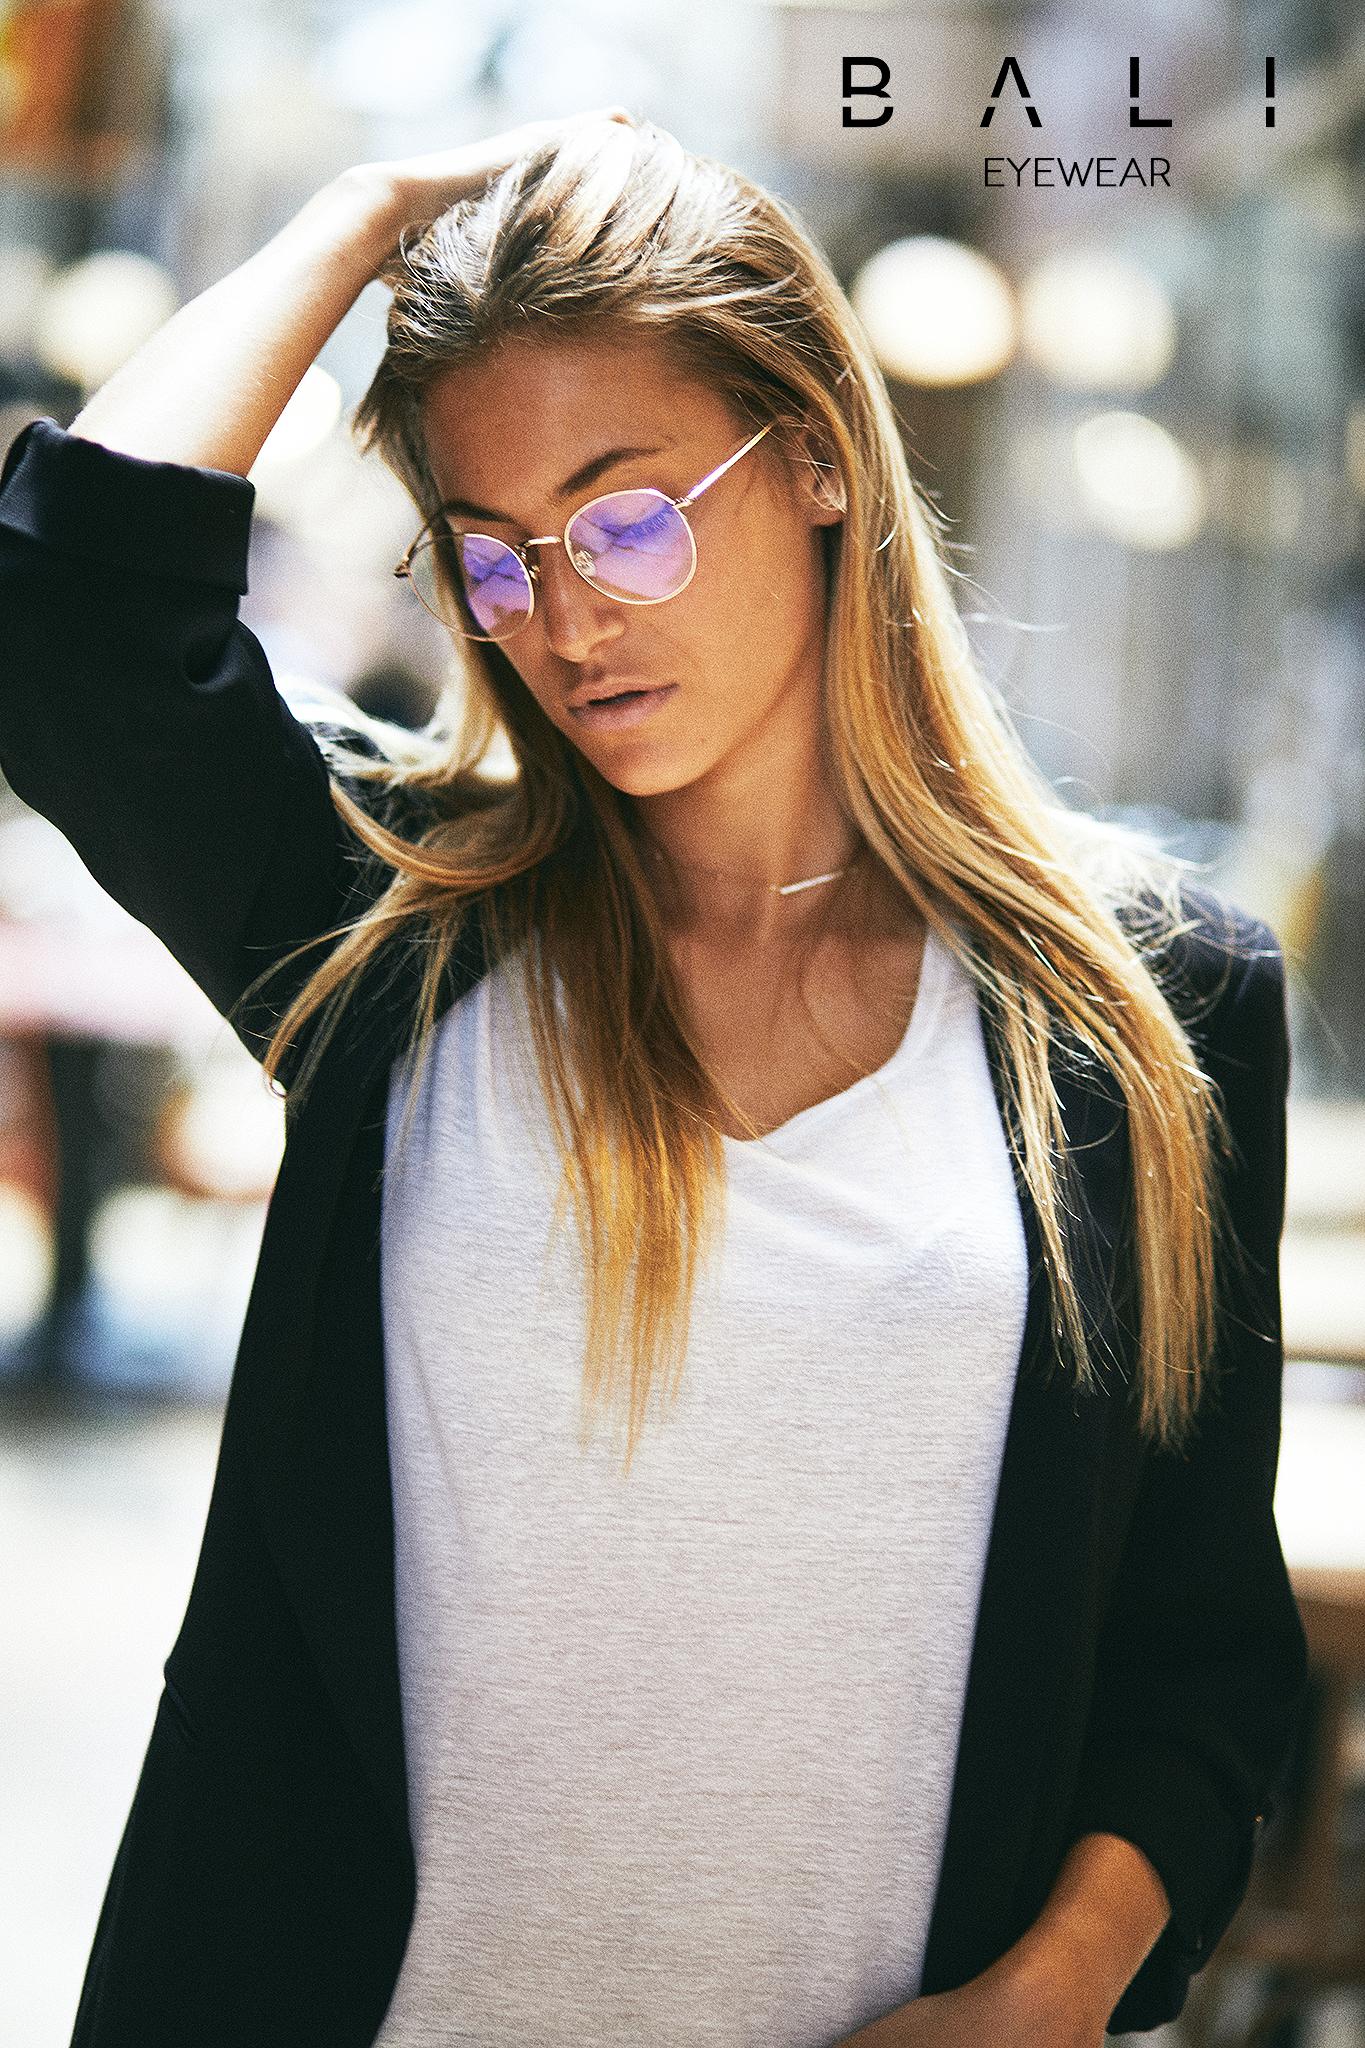 BALI Eyewear